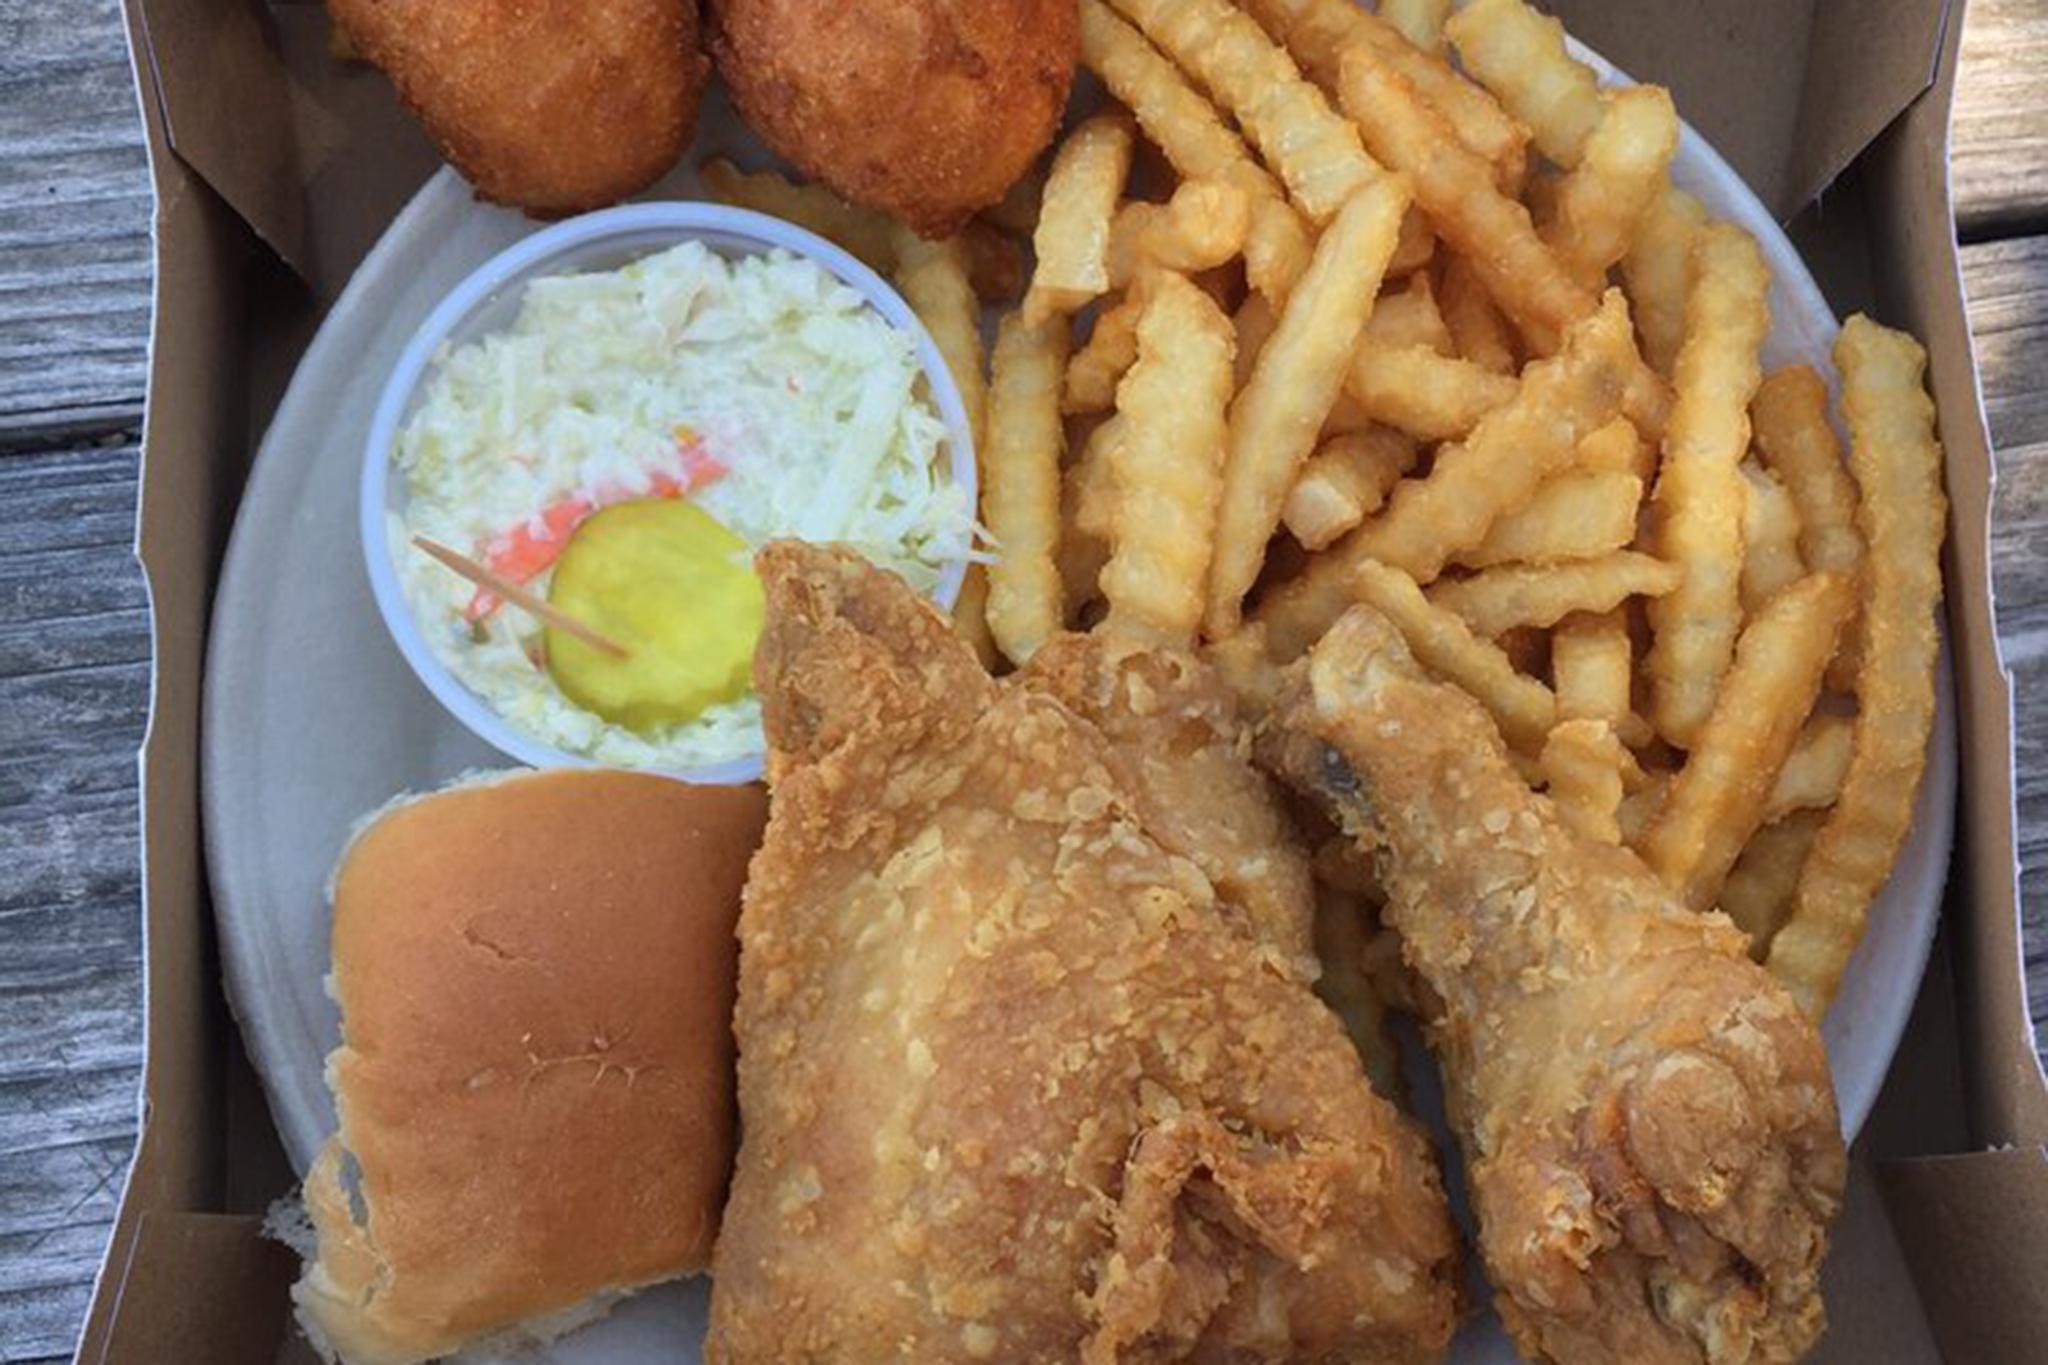 Price's Chicken Coop